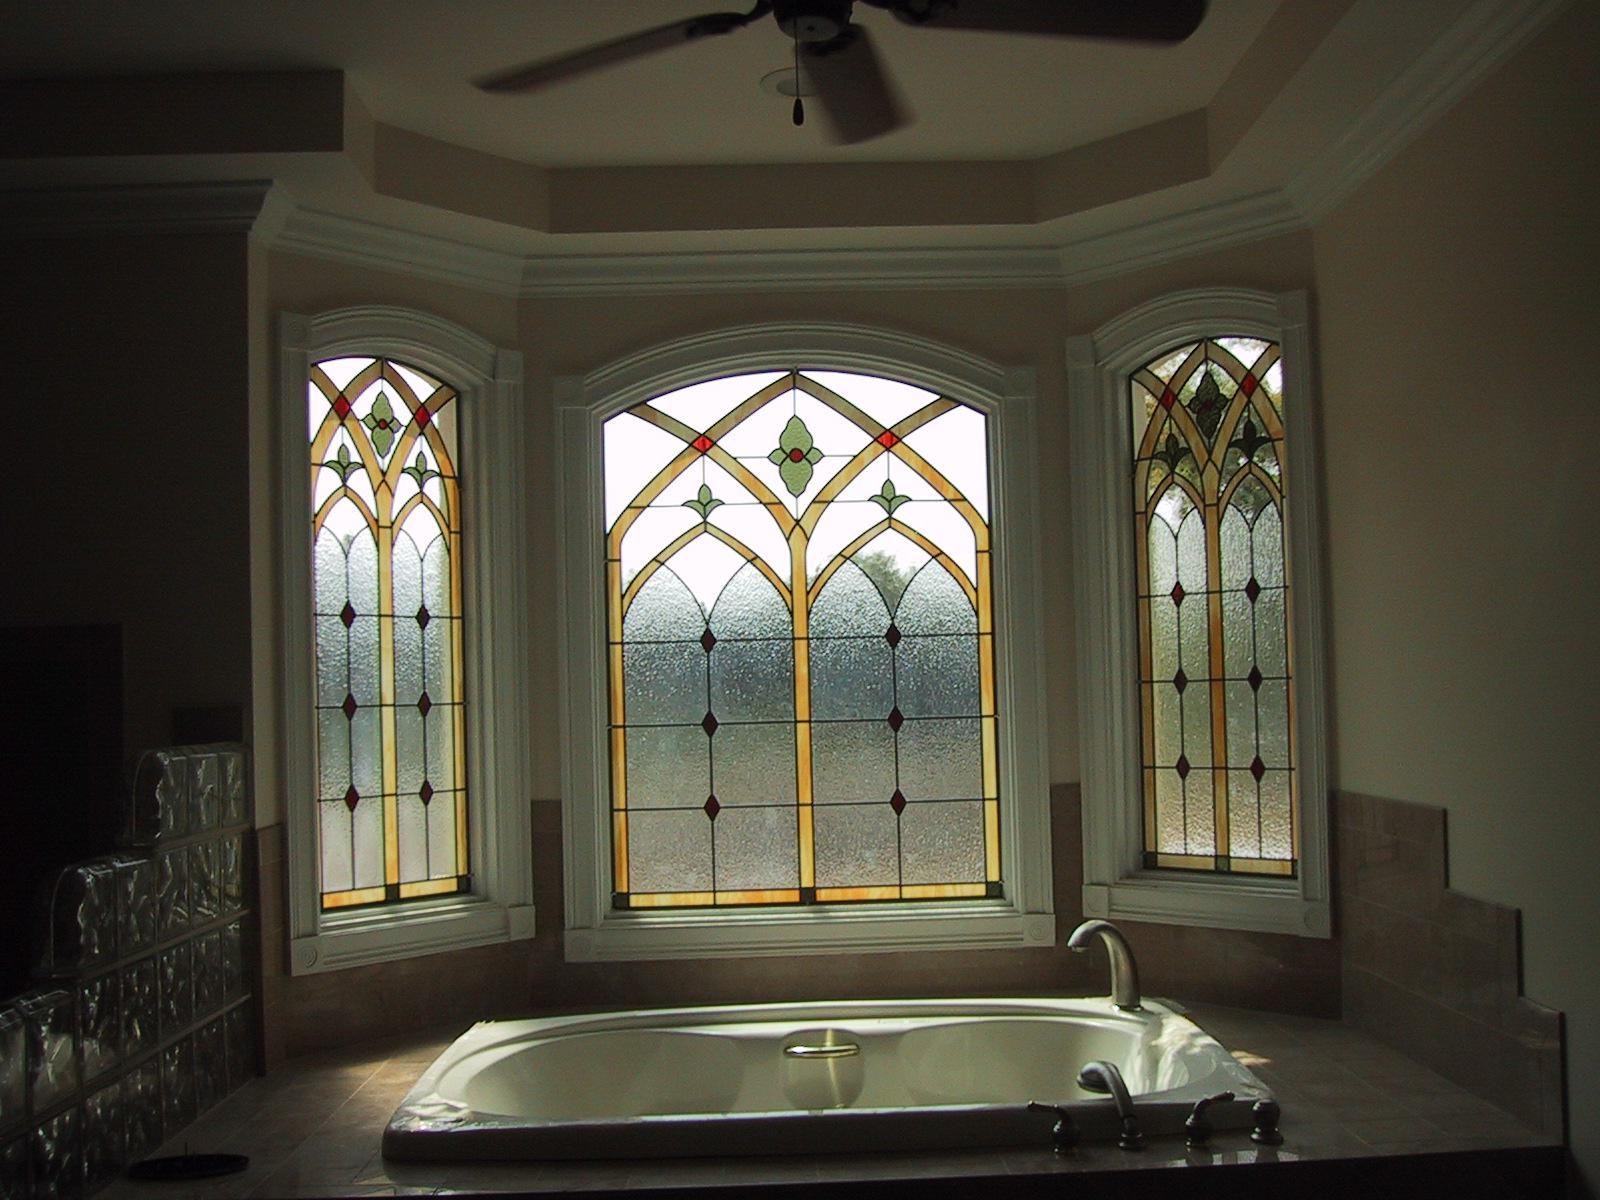 Custom leaded glass bathroom window by the looking glass for Stained glass bathroom window designs